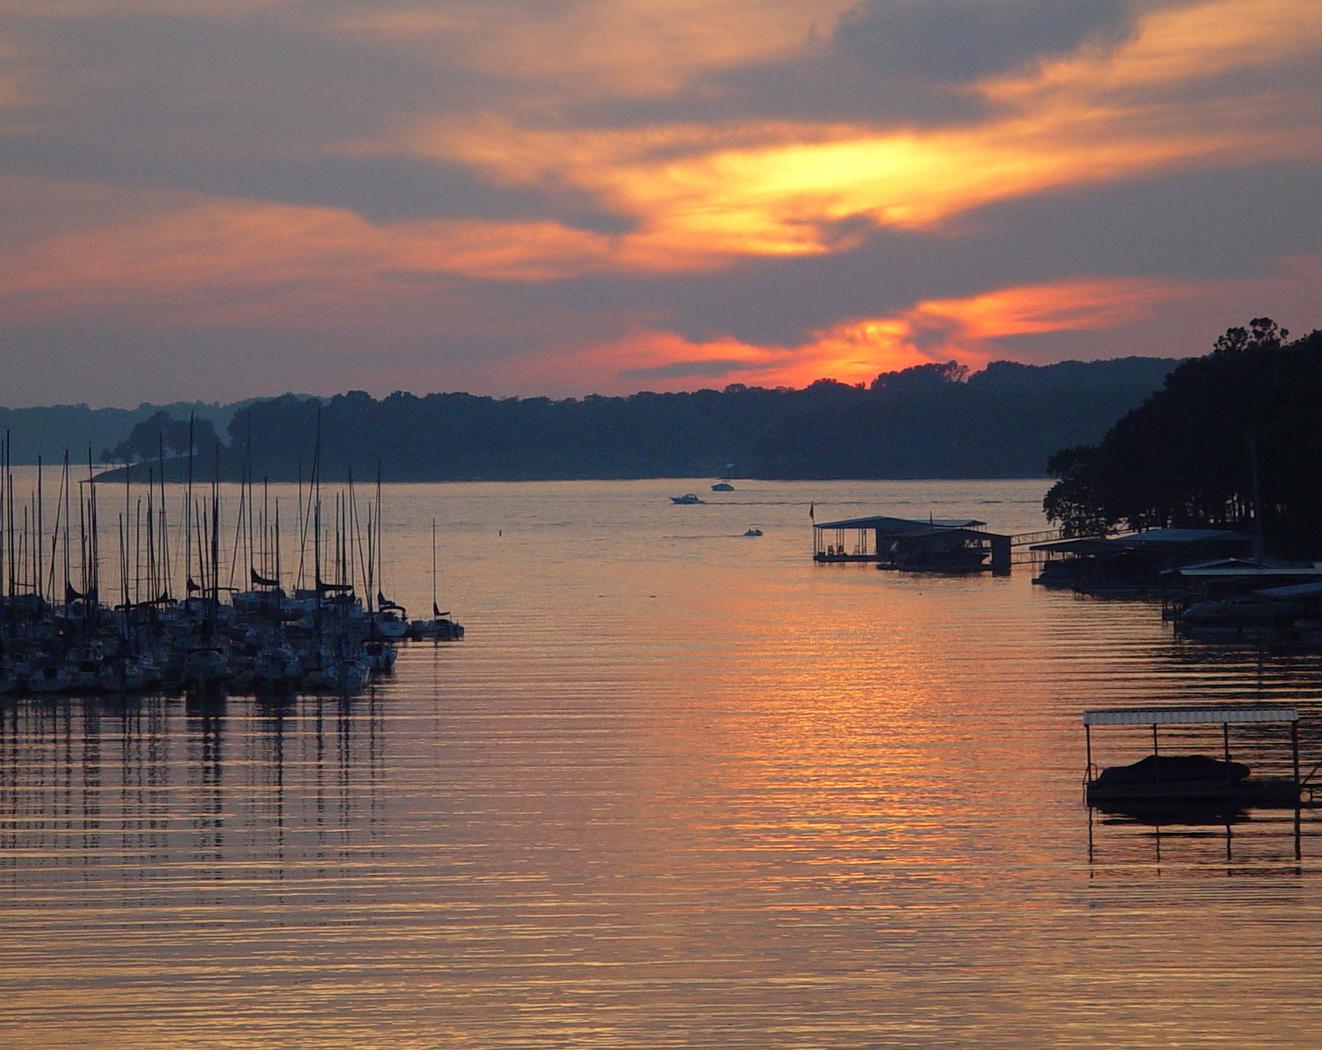 Monkey Island: New RV Resort on Grand Lake, OK   Good Sam Camping Blog